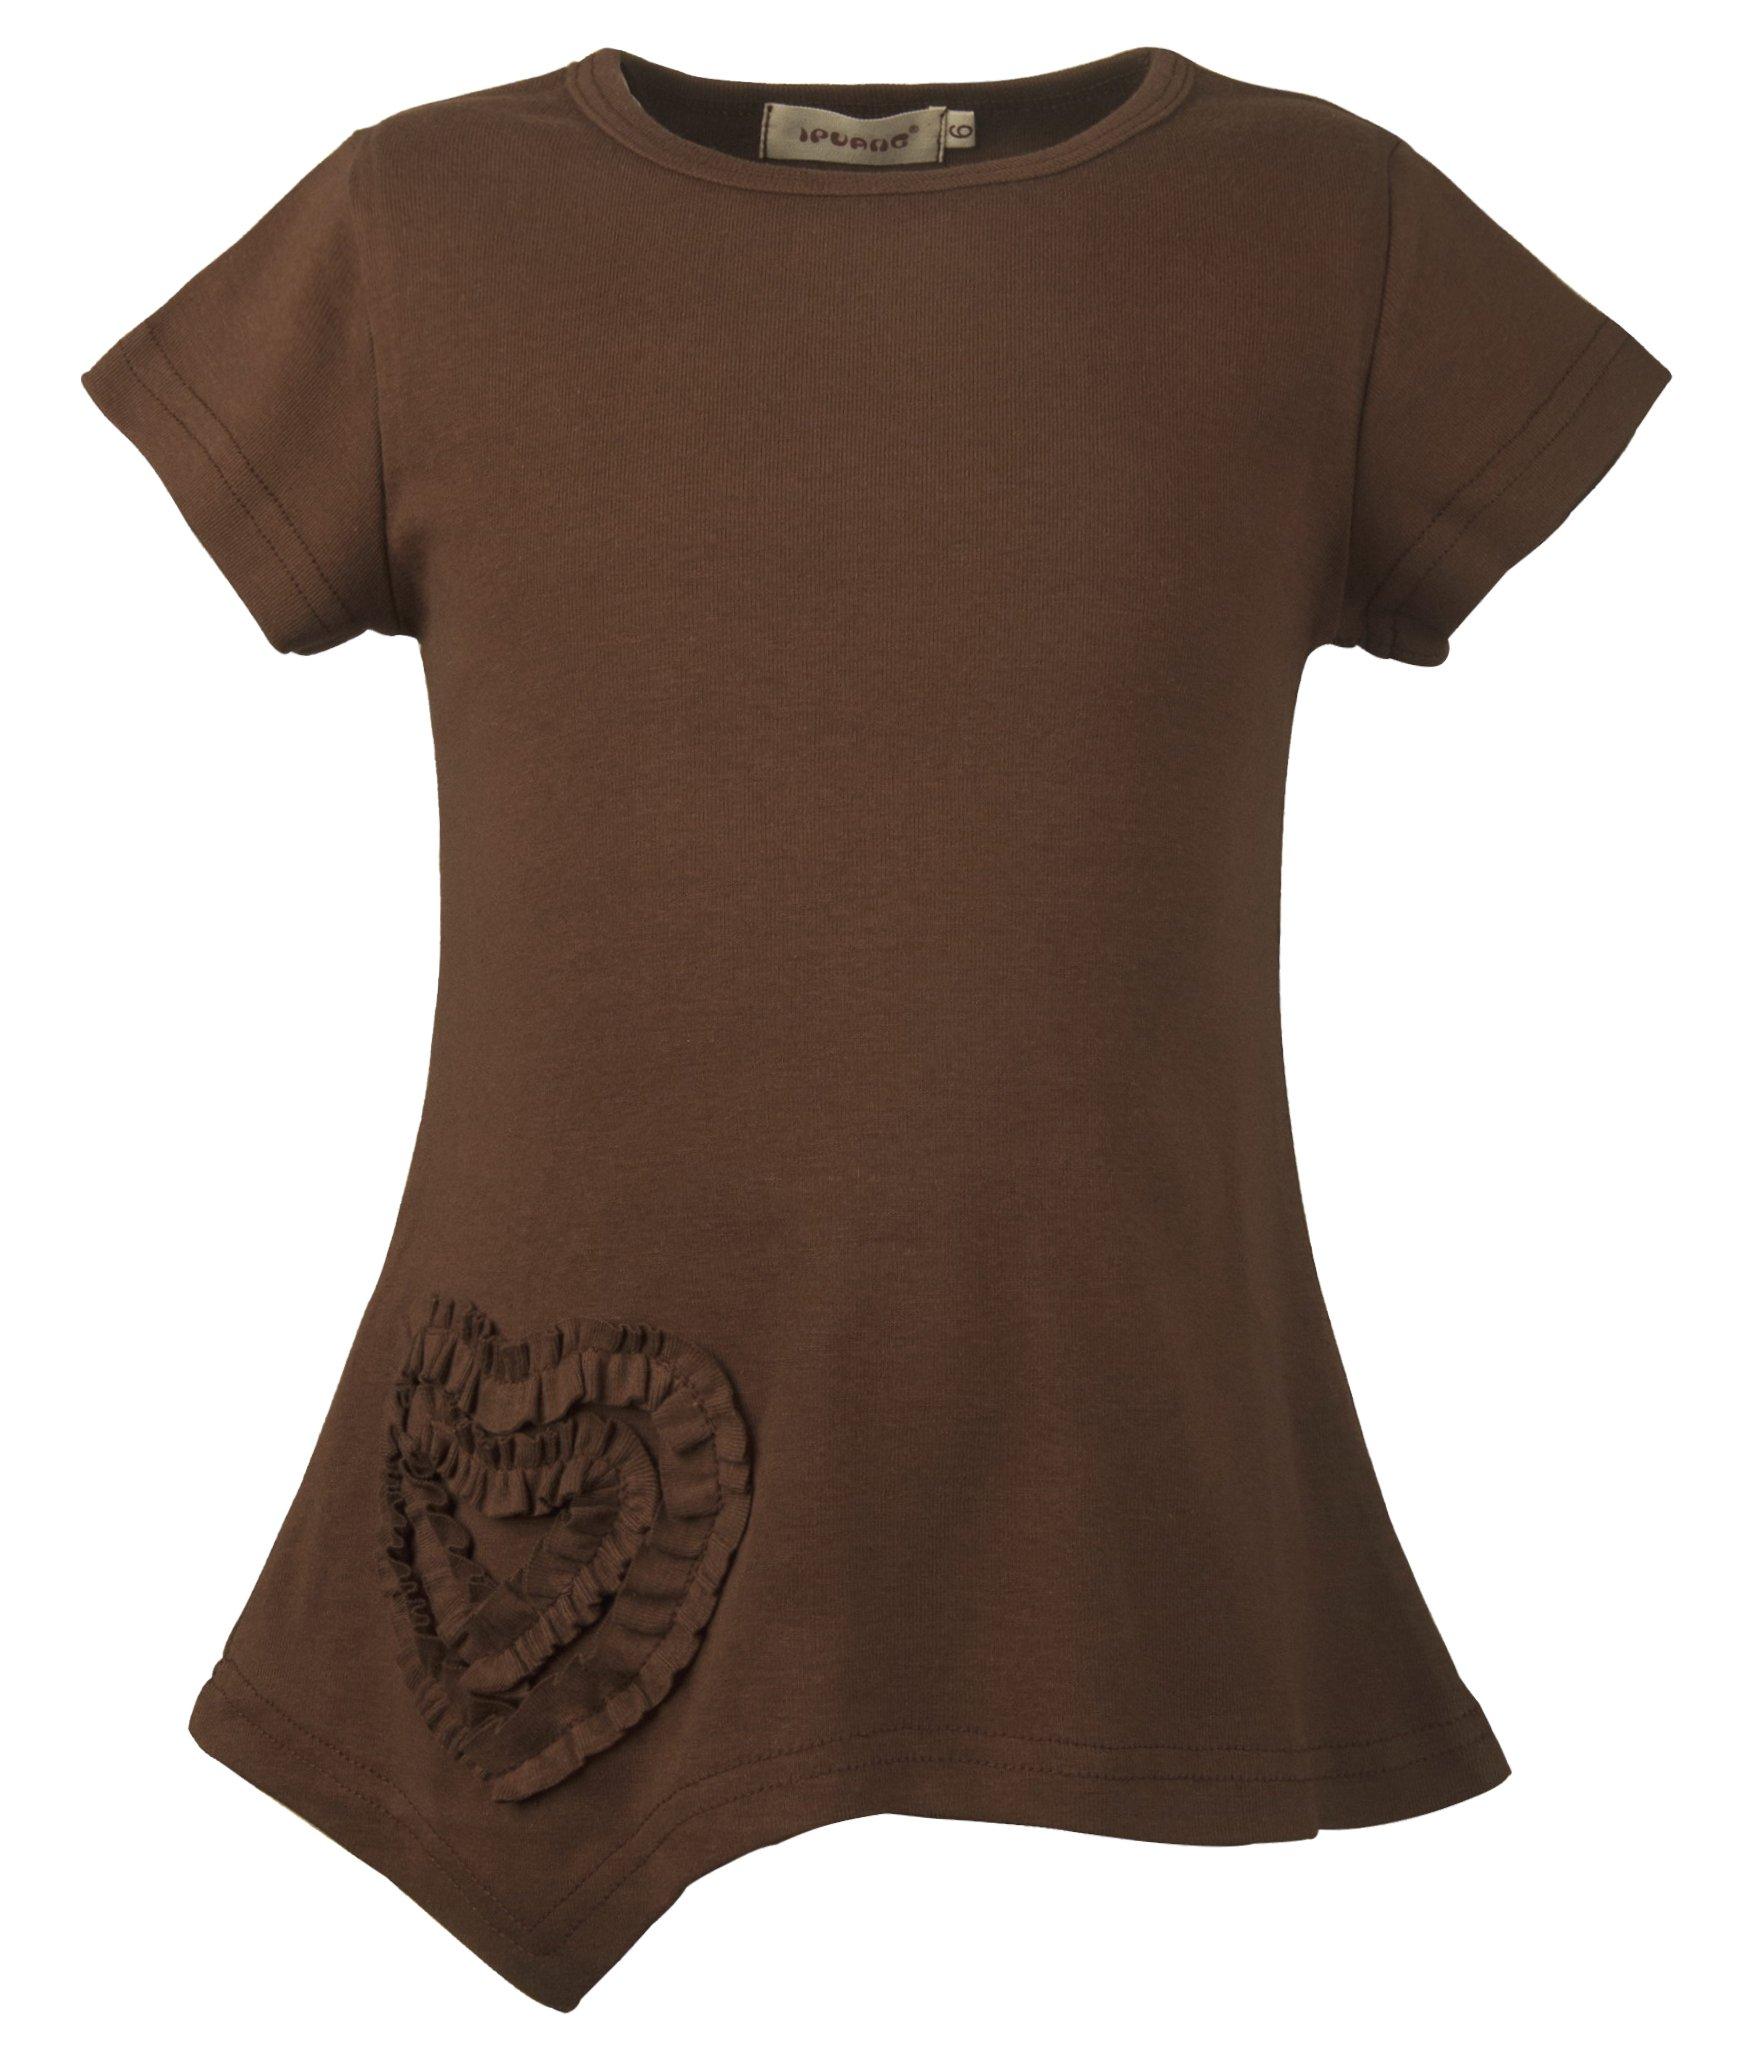 Ipuang Little Girls Heart Shaped Casual Cotton Cap Sleeve Tee T Shirt Top Brown 6